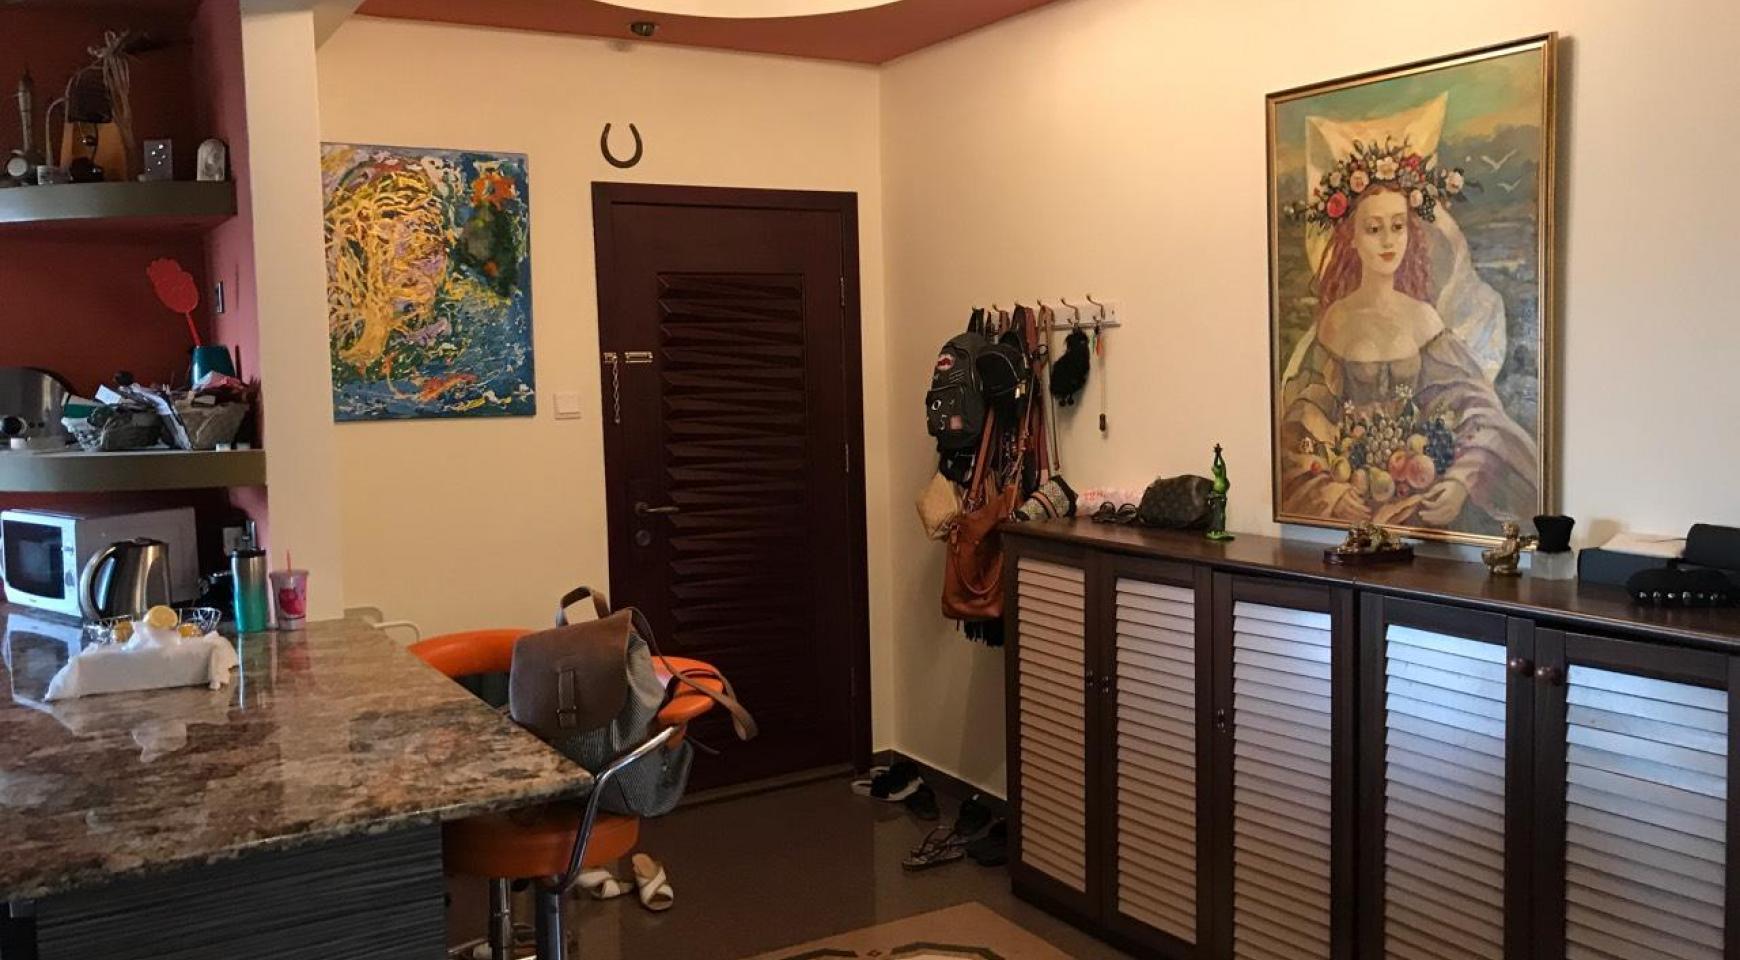 3 Bedroom Apartment in Molos Area near Limassol Marina - 4